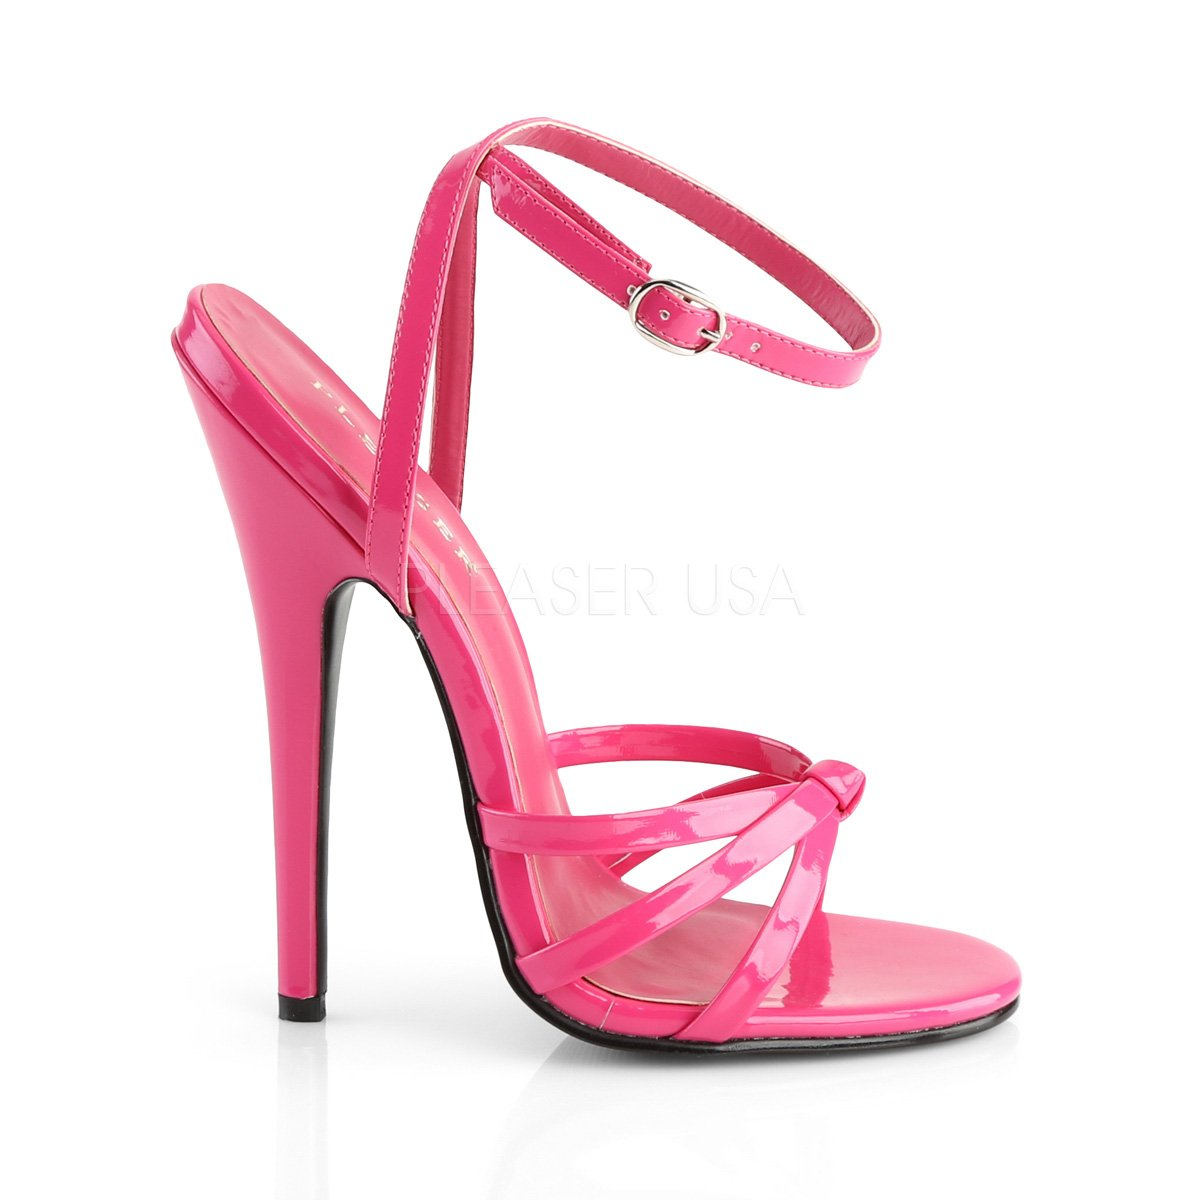 e9c9475fc56997 Higher-Heels PleaserUSA Damen Stiletto Sandaletten Sandalen Domina-108 Lack  hot pink  Amazon.de  Schuhe   Handtaschen